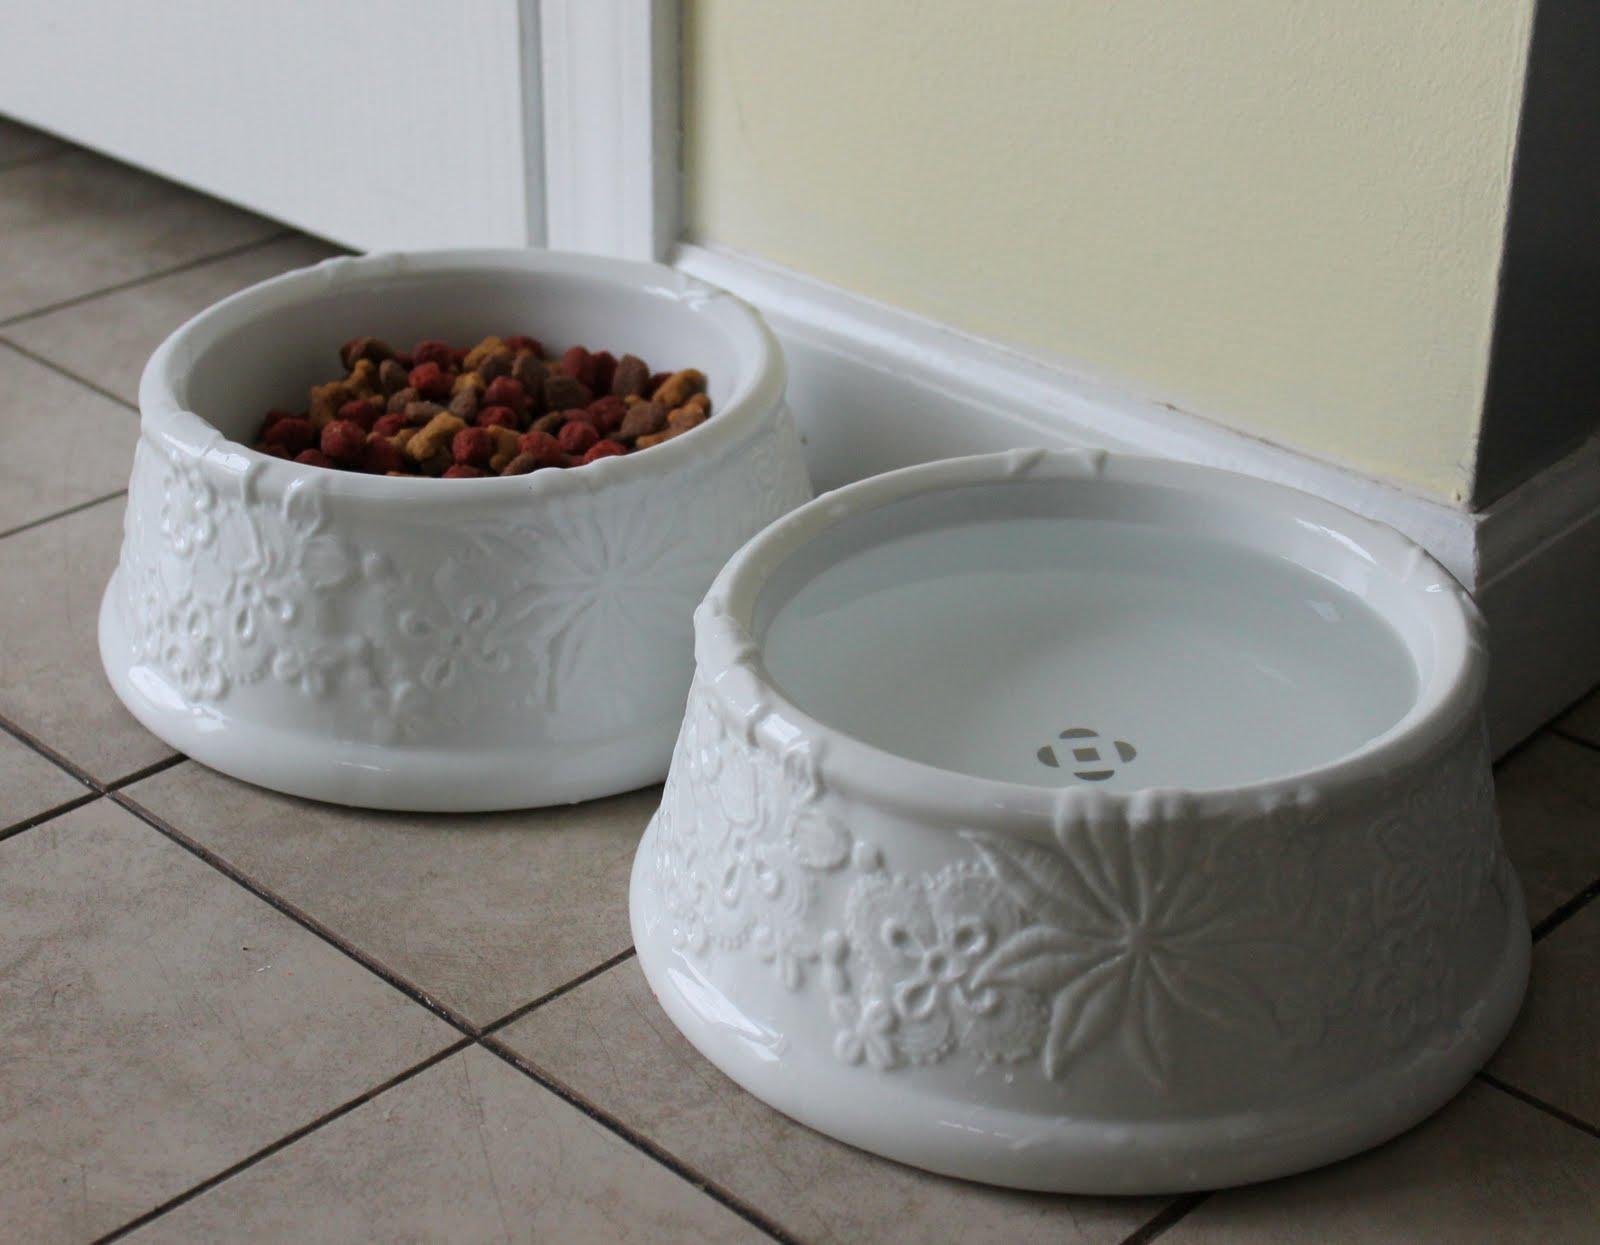 Uncategorized Cute Dog Bowl hems and haws the cadillac of dog bowls